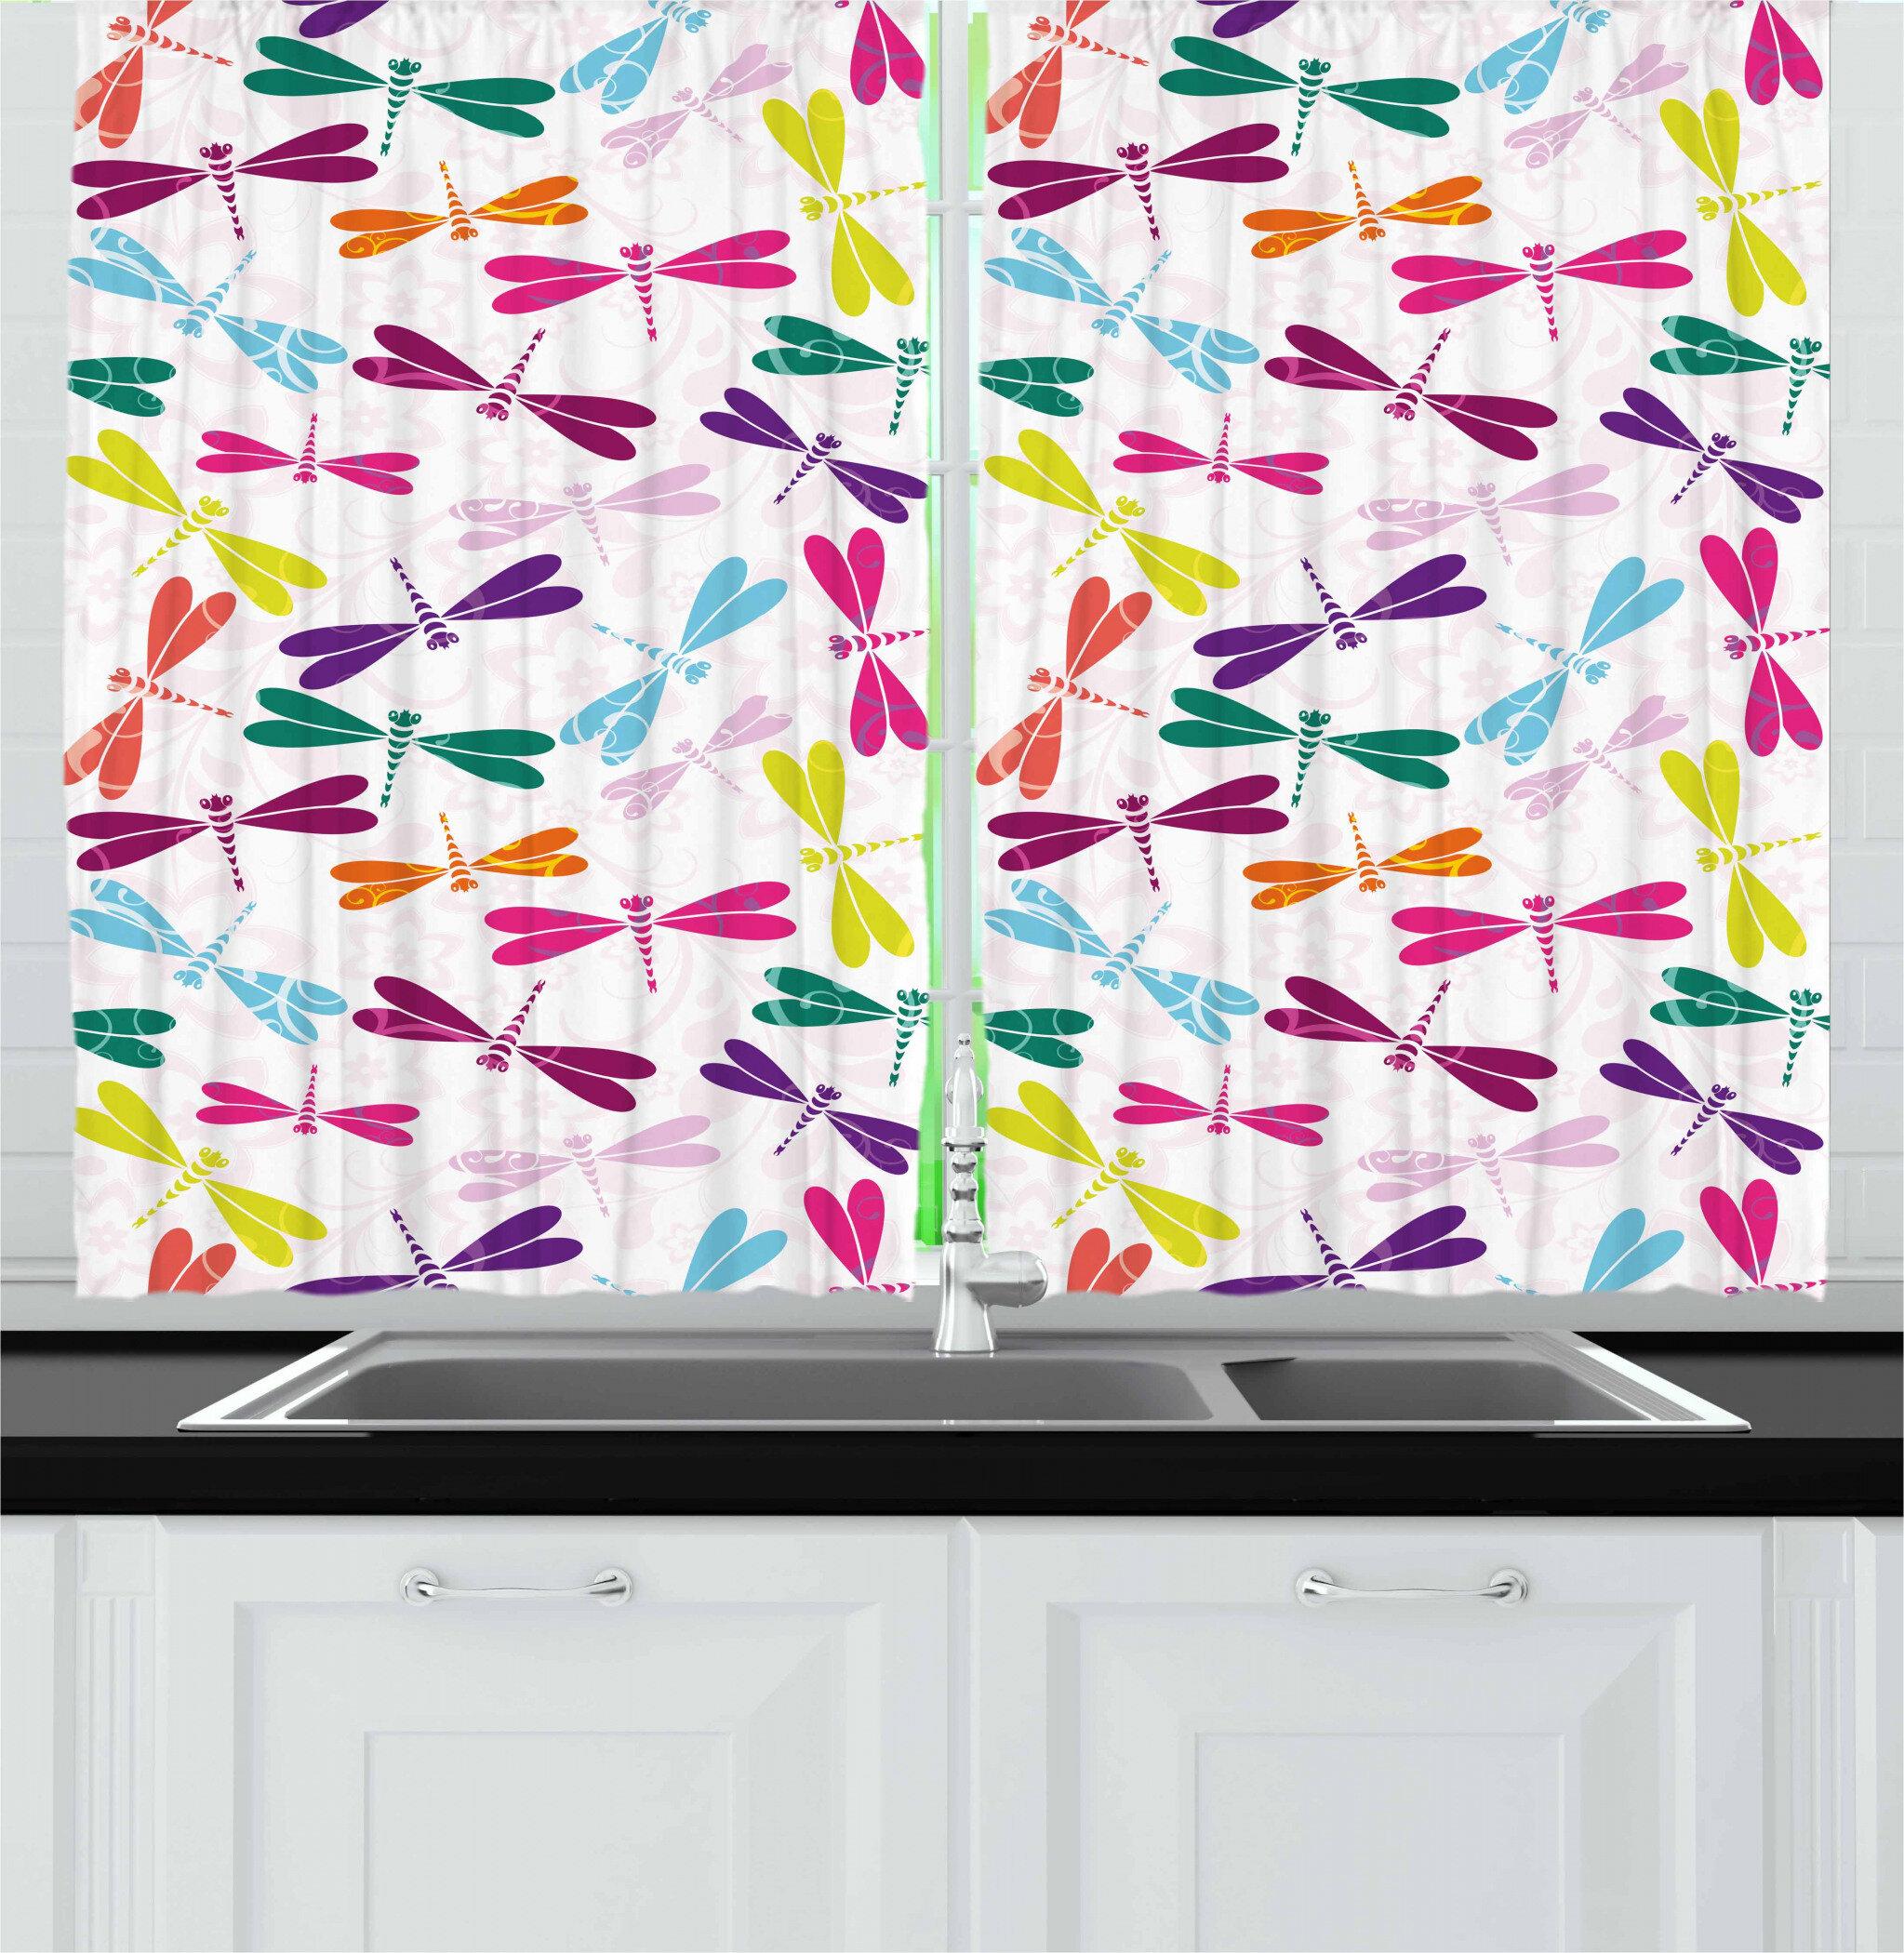 East Urban Home Dragonfly Kitchen Curtain Wayfair